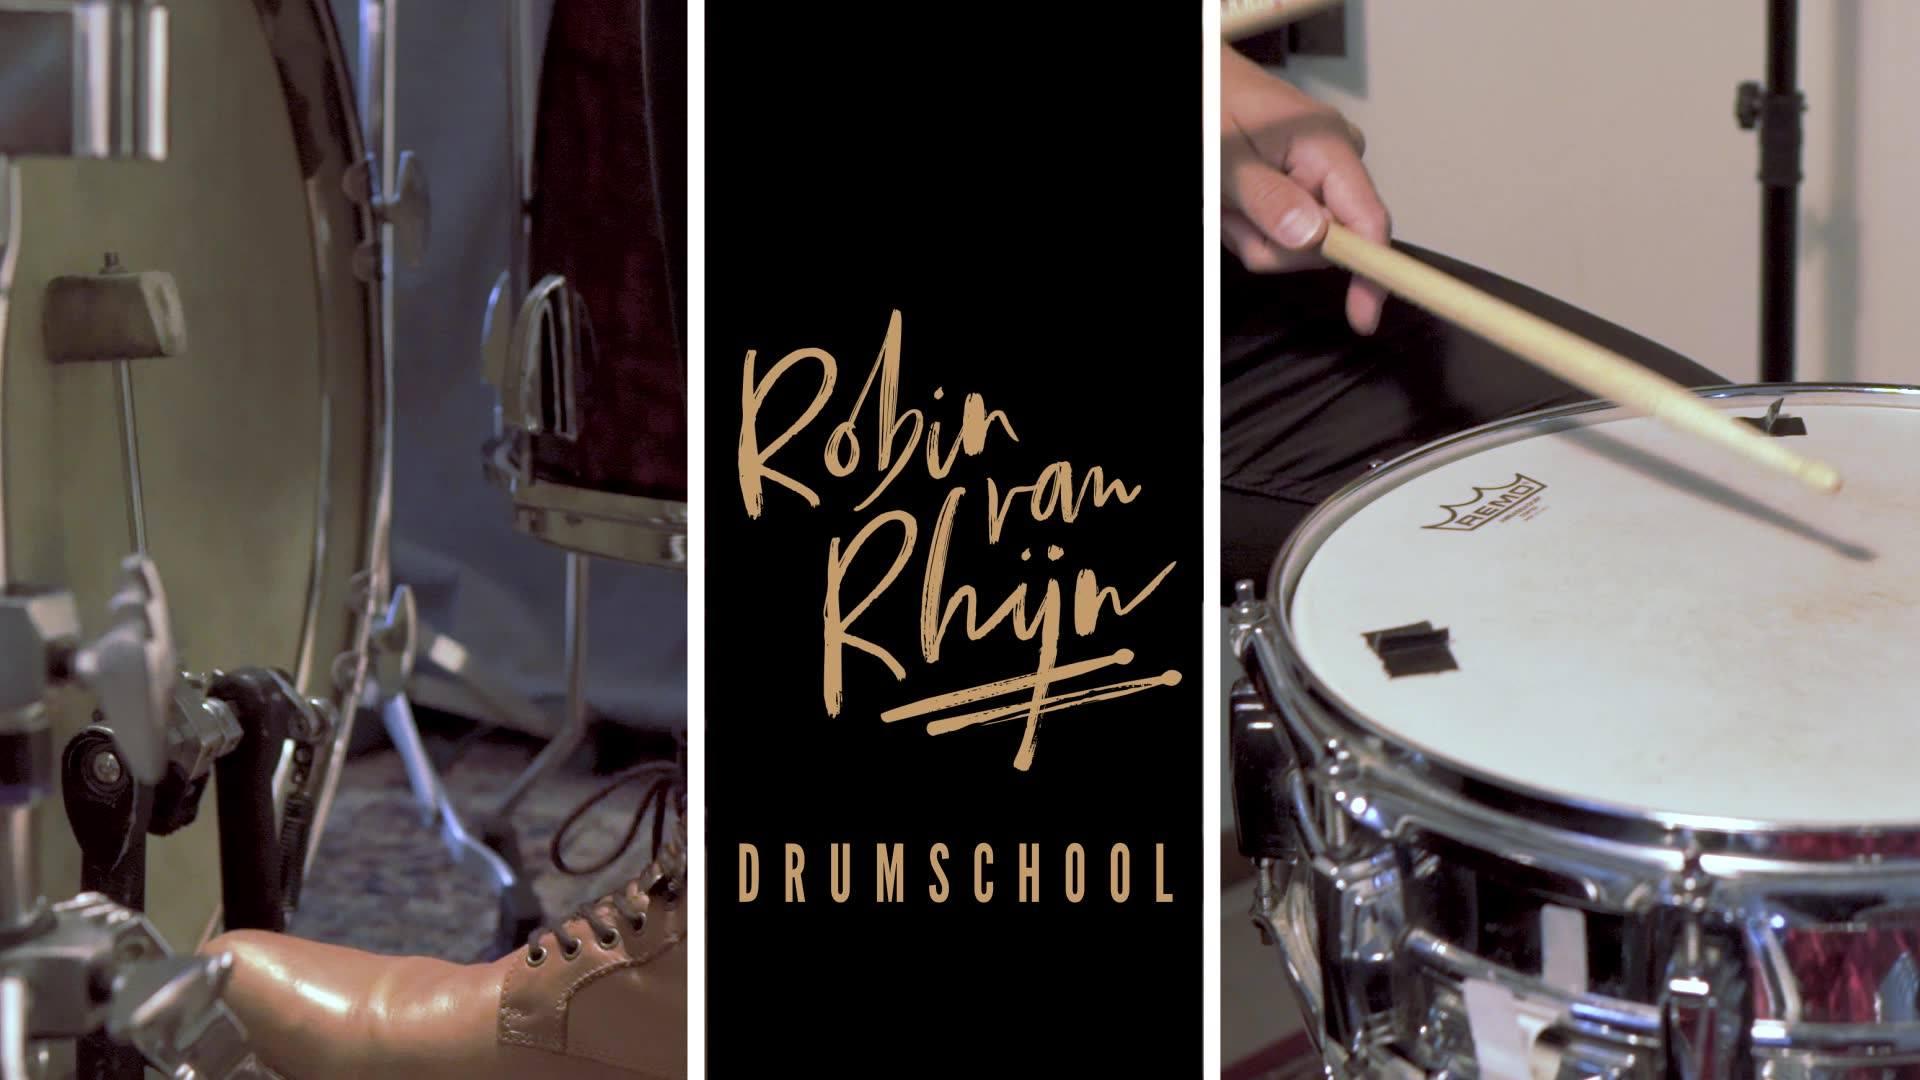 drumschool robin omslag